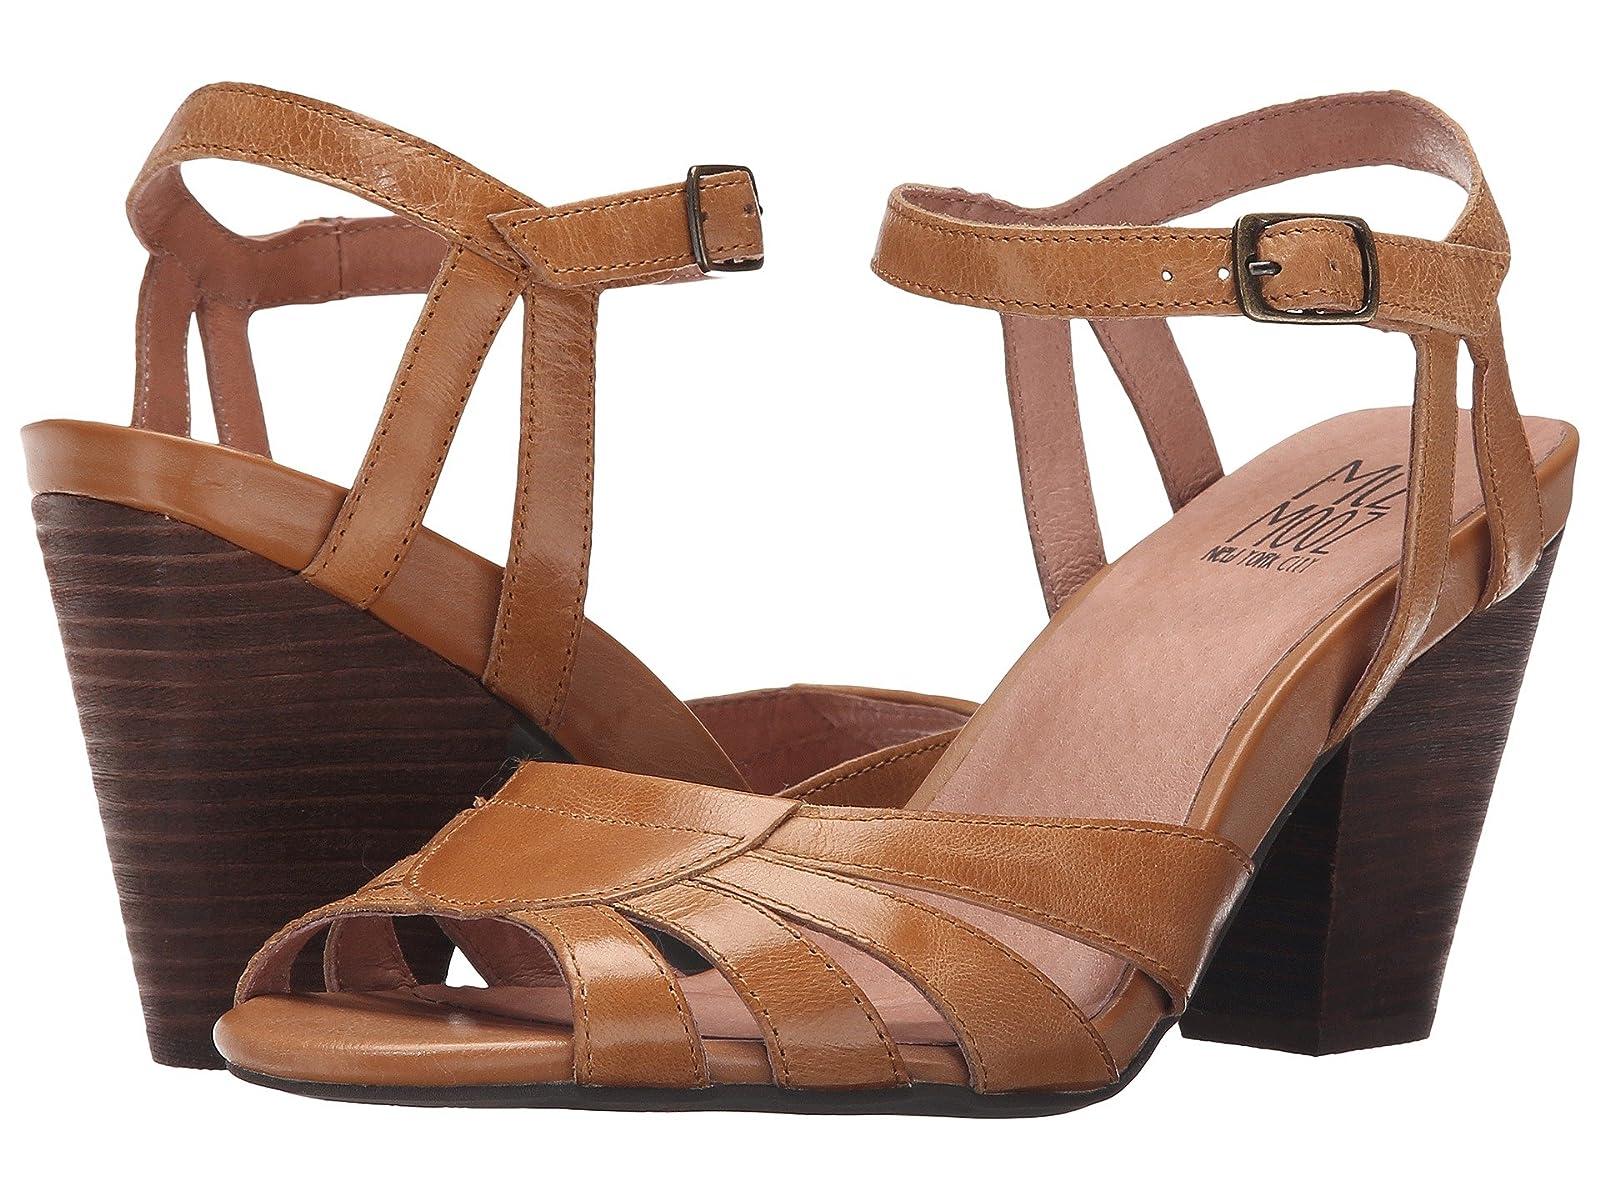 Miz Mooz MarissaCheap and distinctive eye-catching shoes